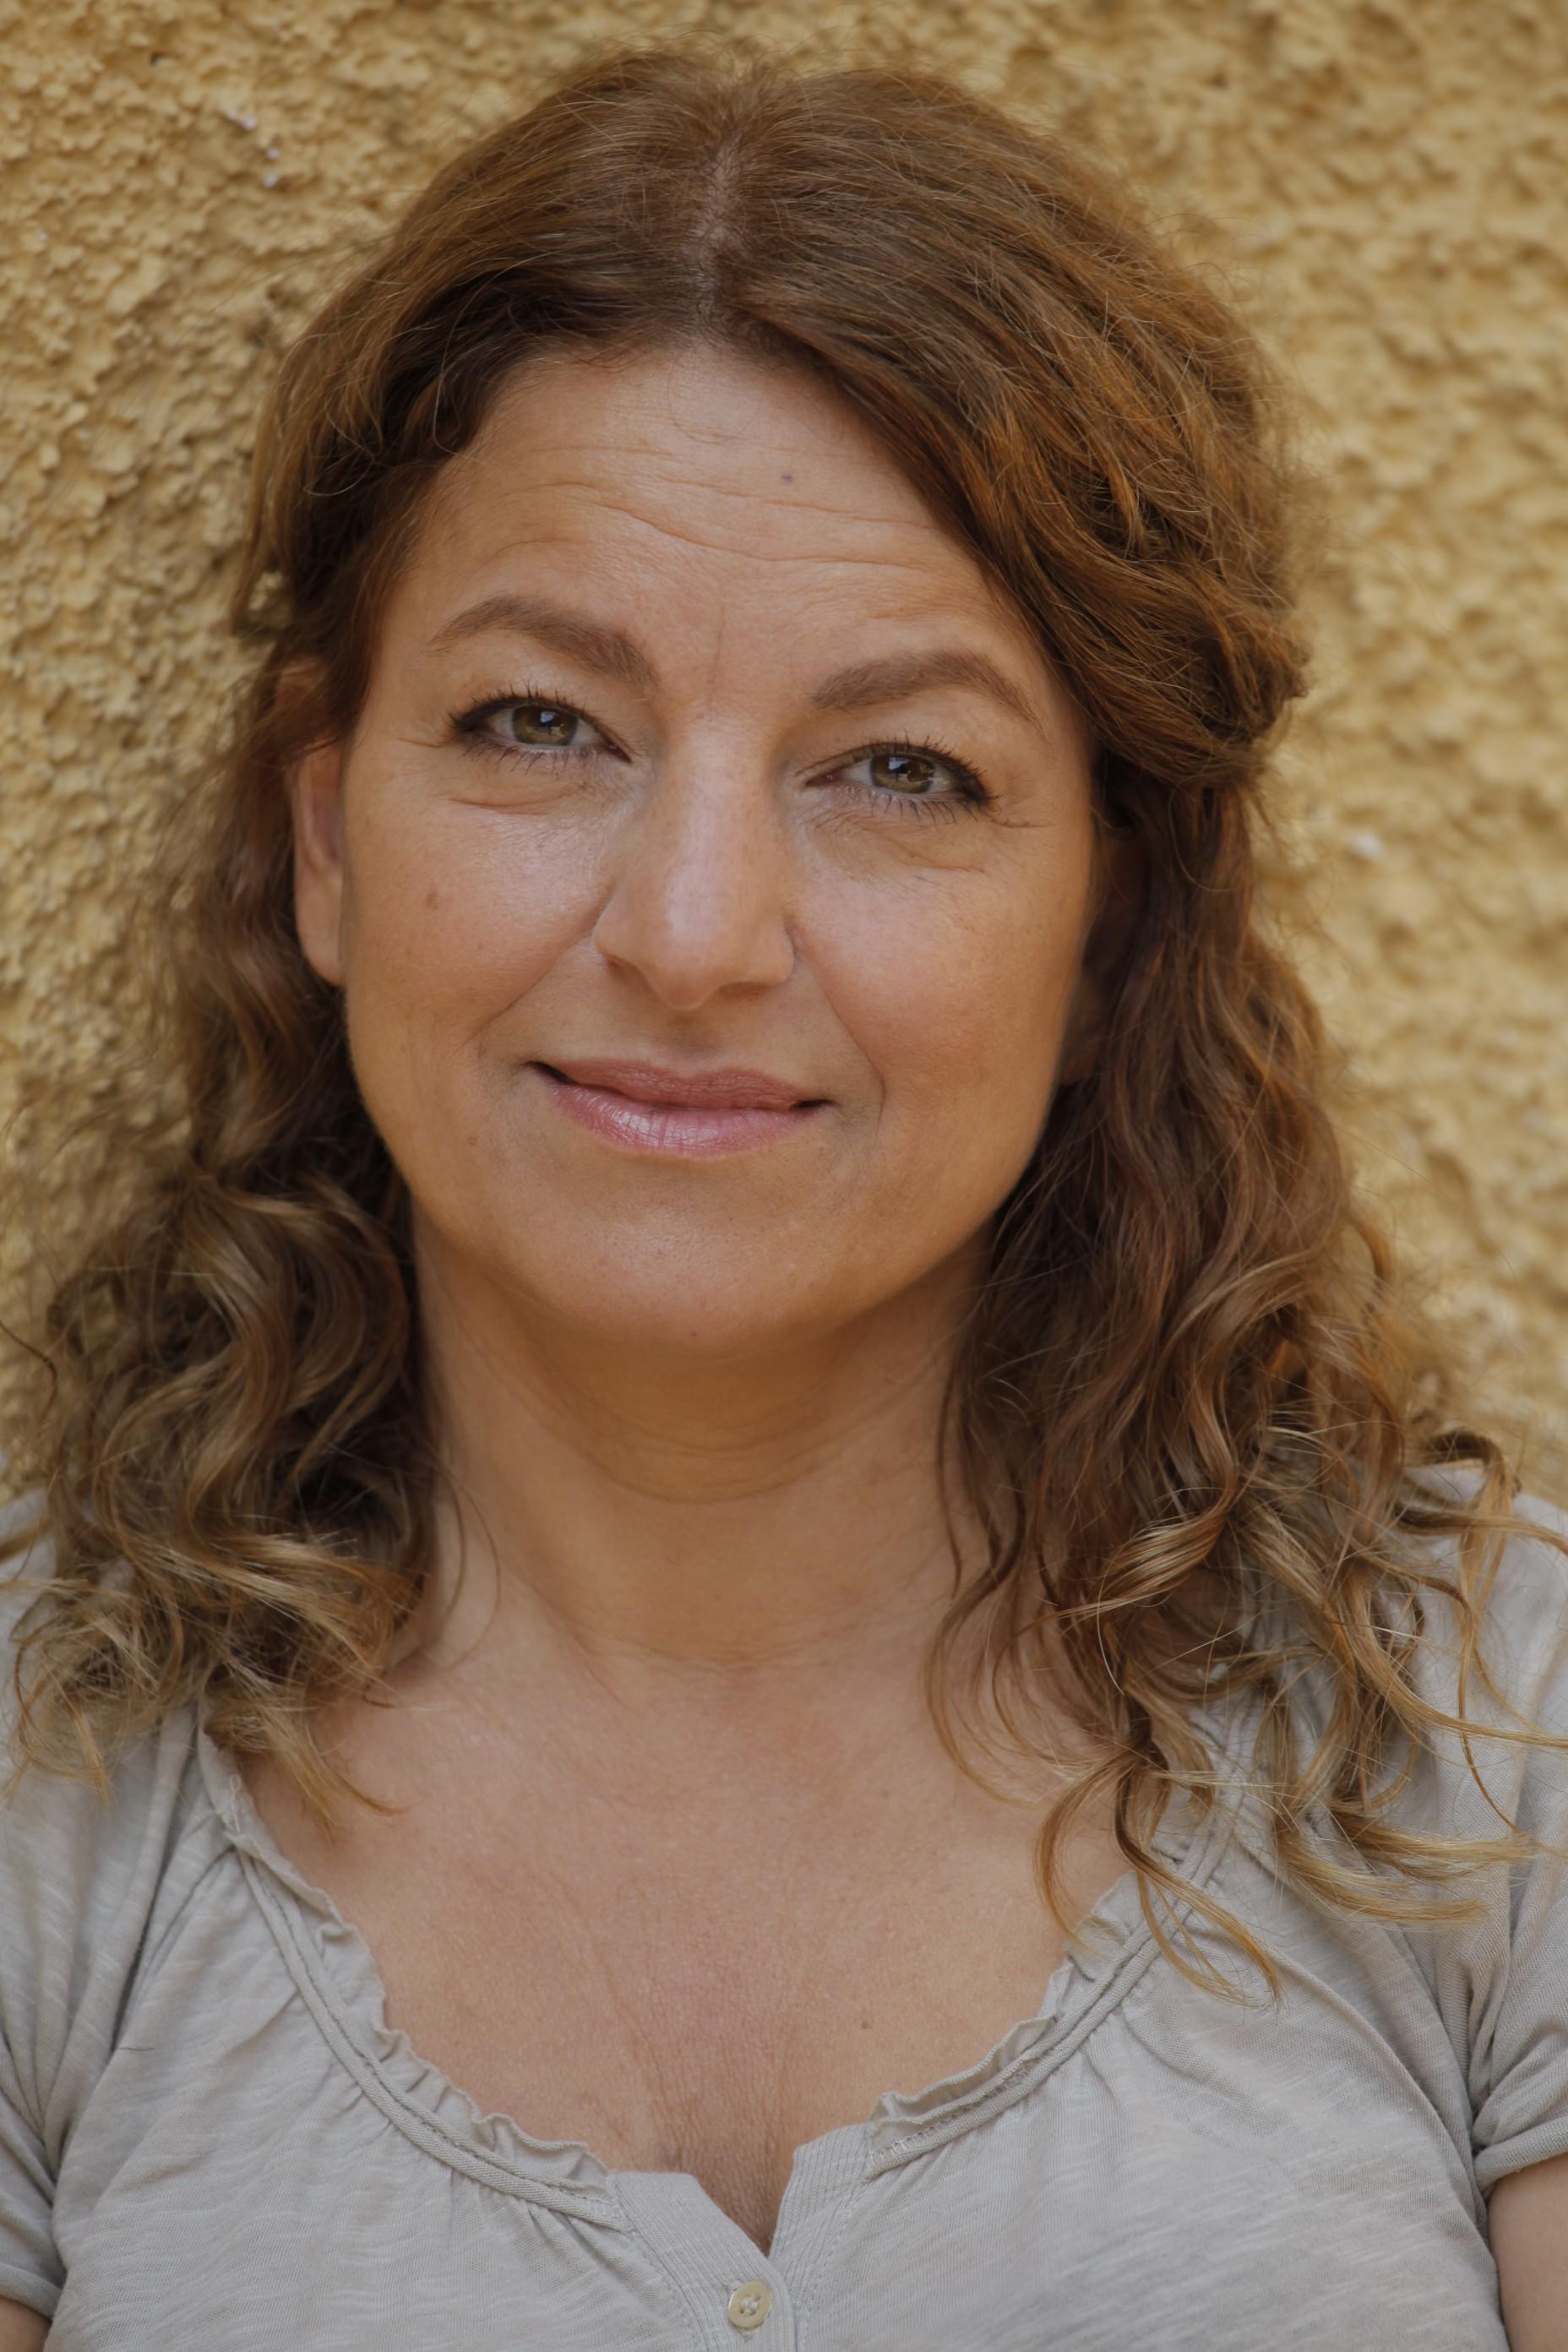 Sema Meray, Fotocredit: Emanuela Danielewicz